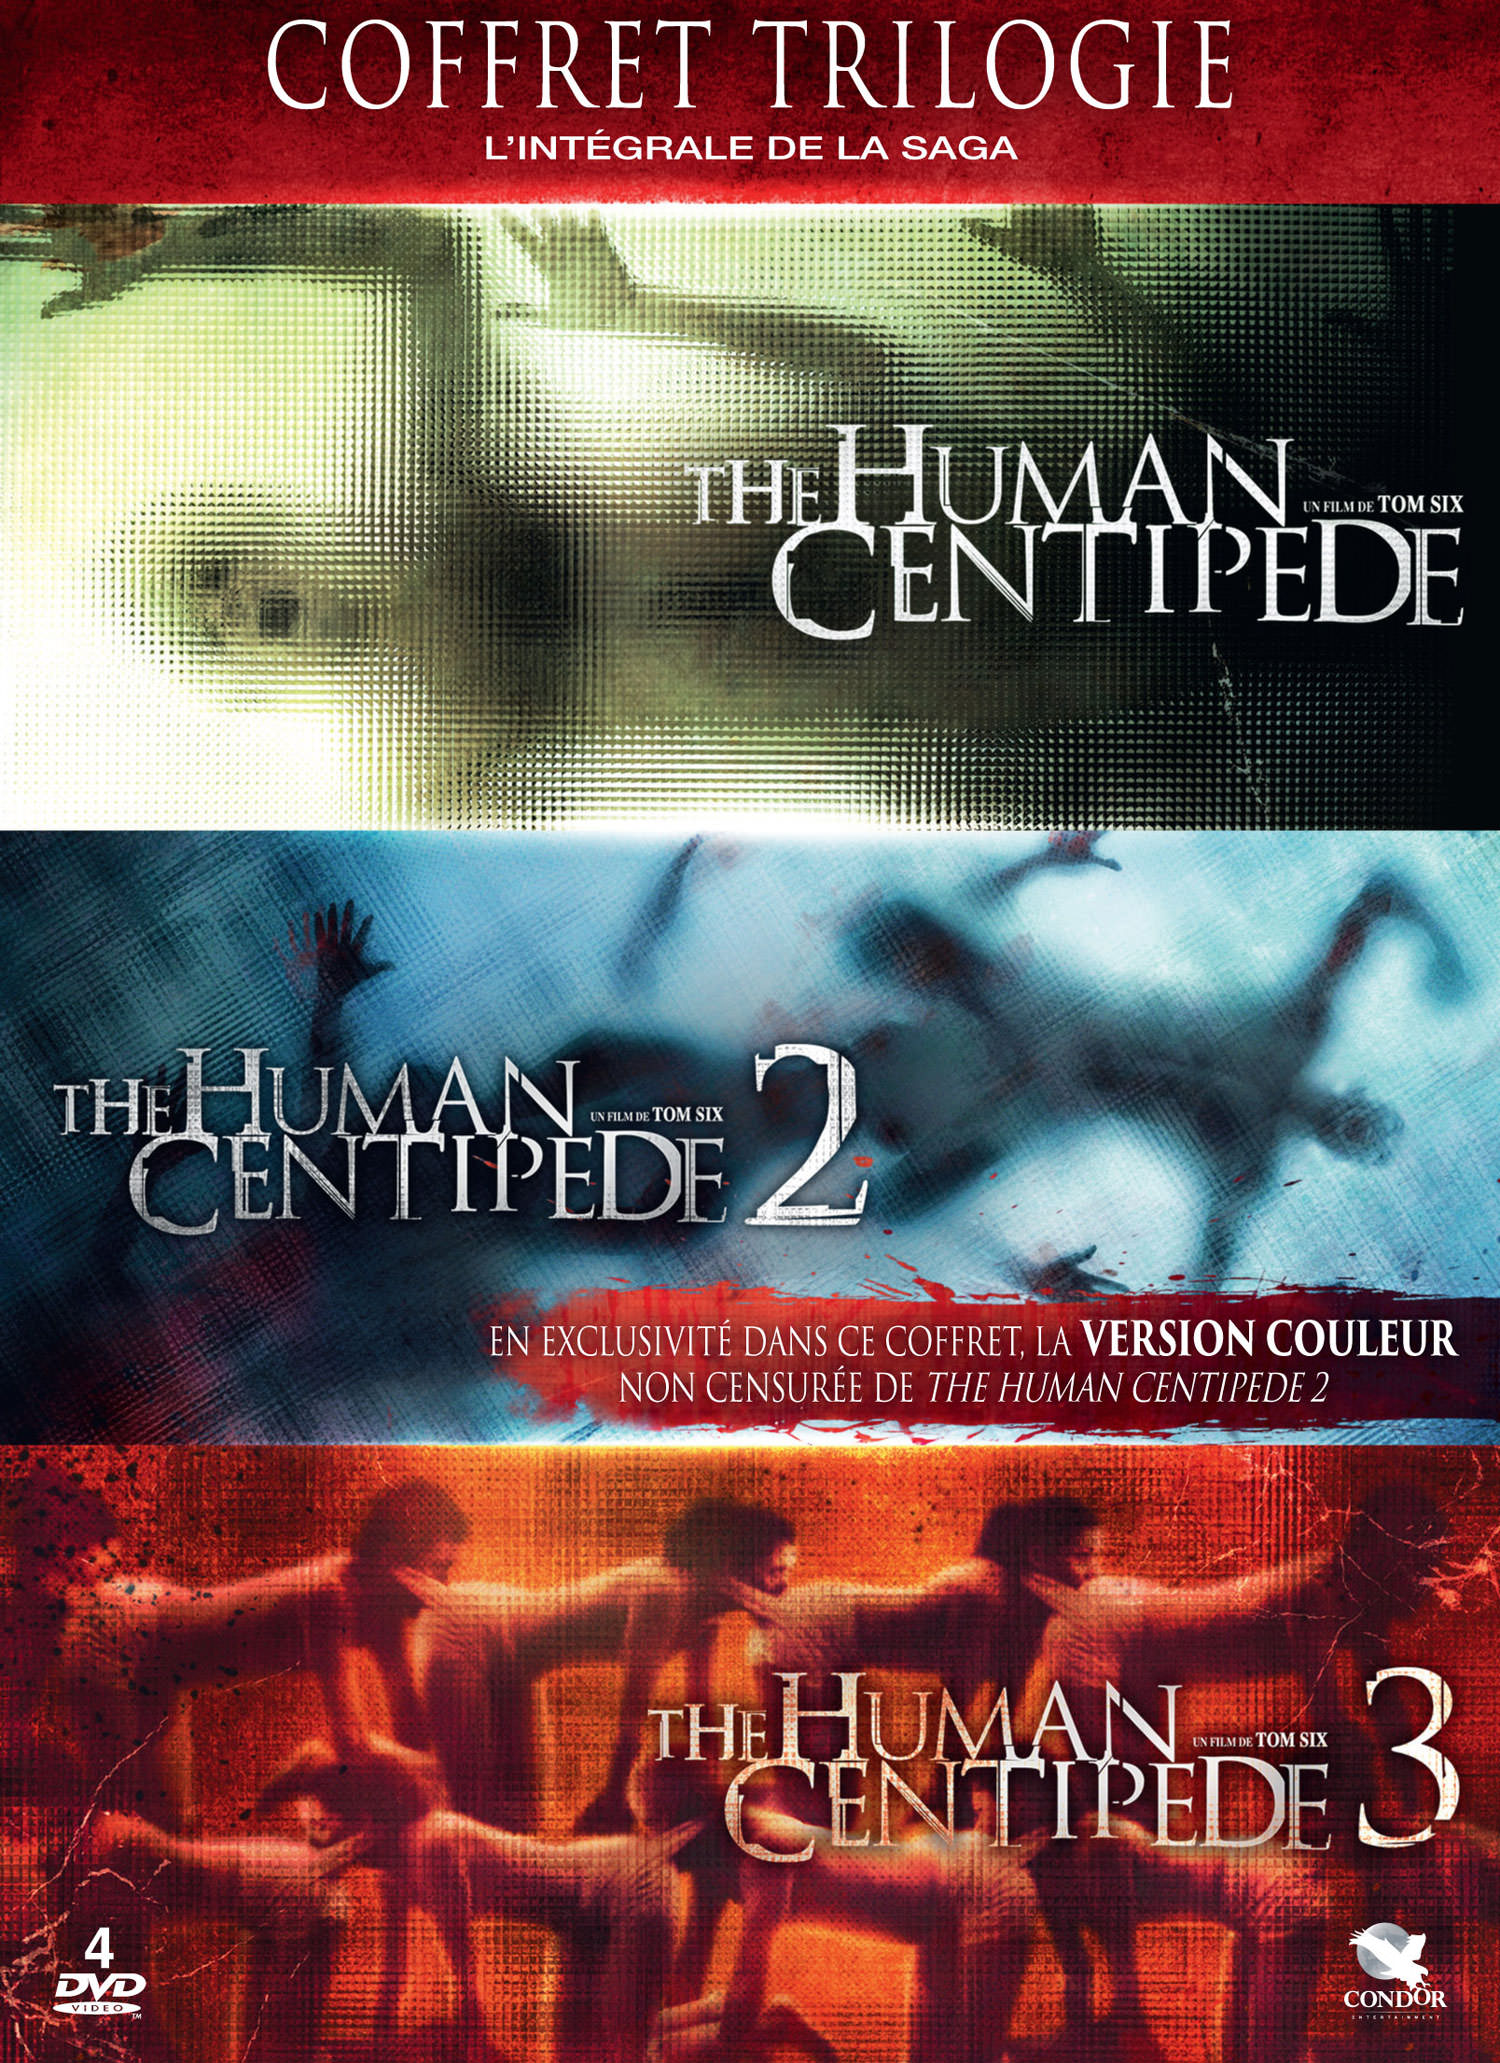 The Human Centipede - Coffret DVD Trilogie